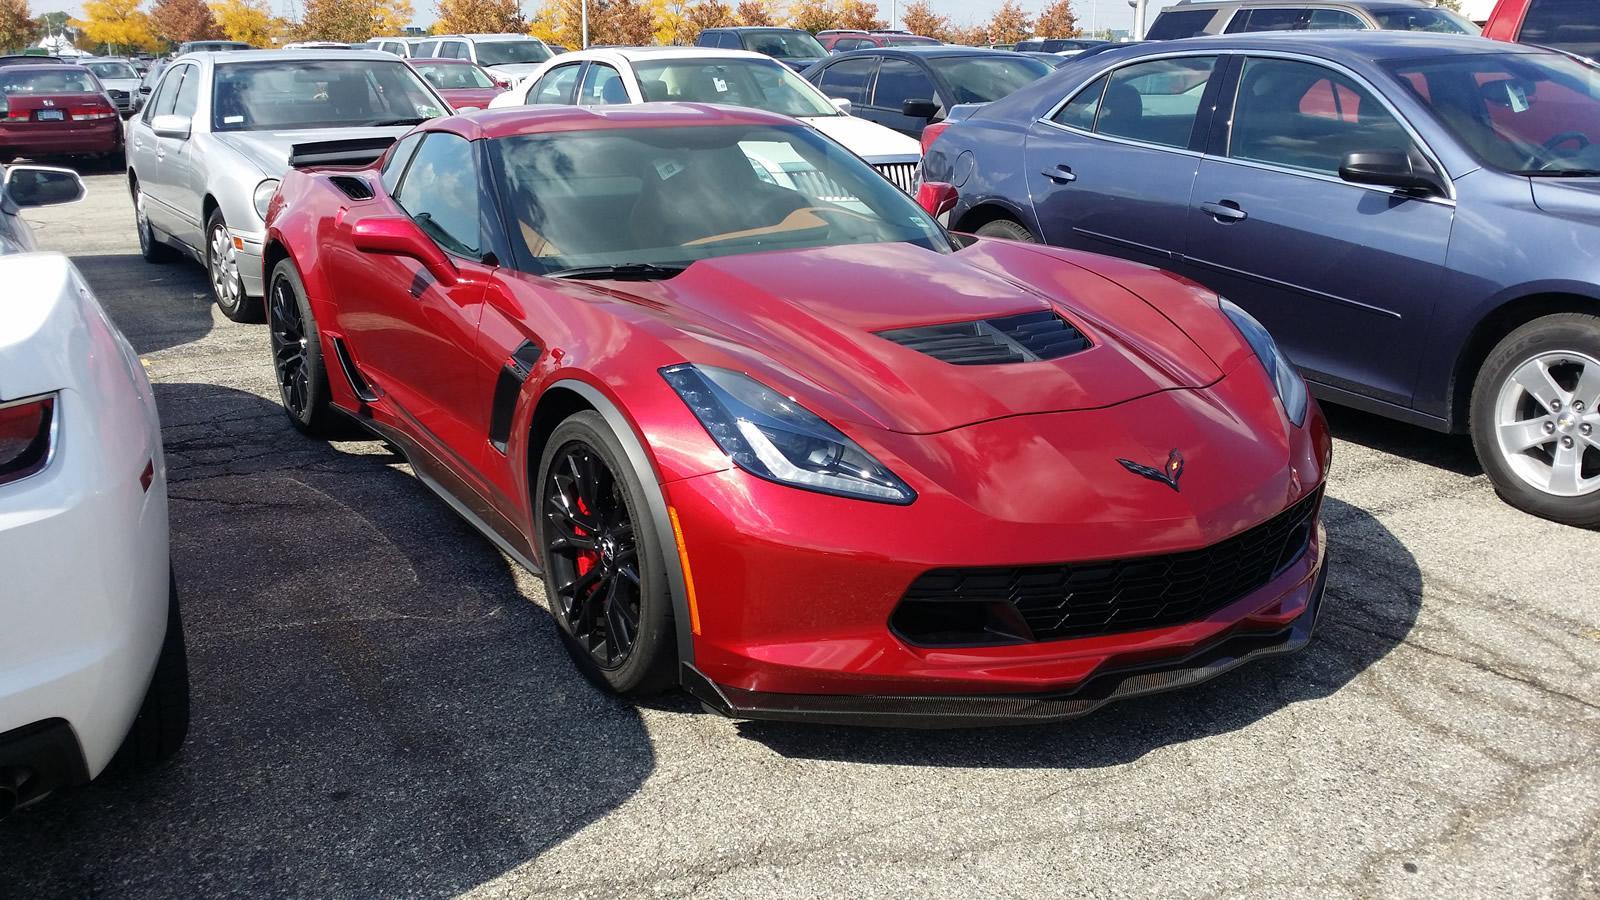 chevrolet corvette 2015 red. prior to the brand new 2015 chevrolet corvette red 0